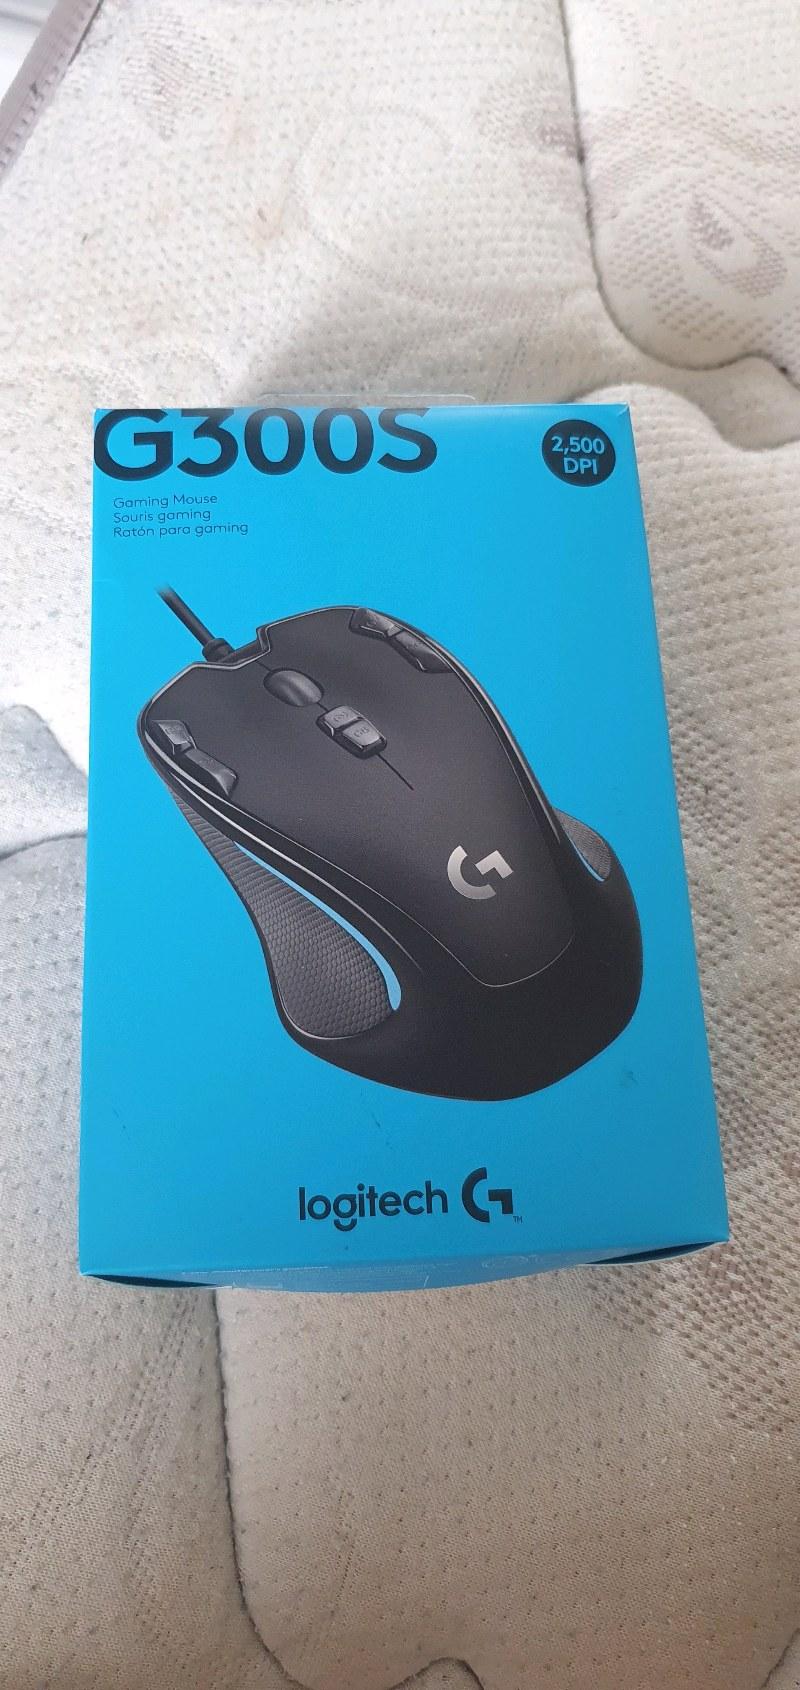 Logitech G300s Oyuncu Mouse